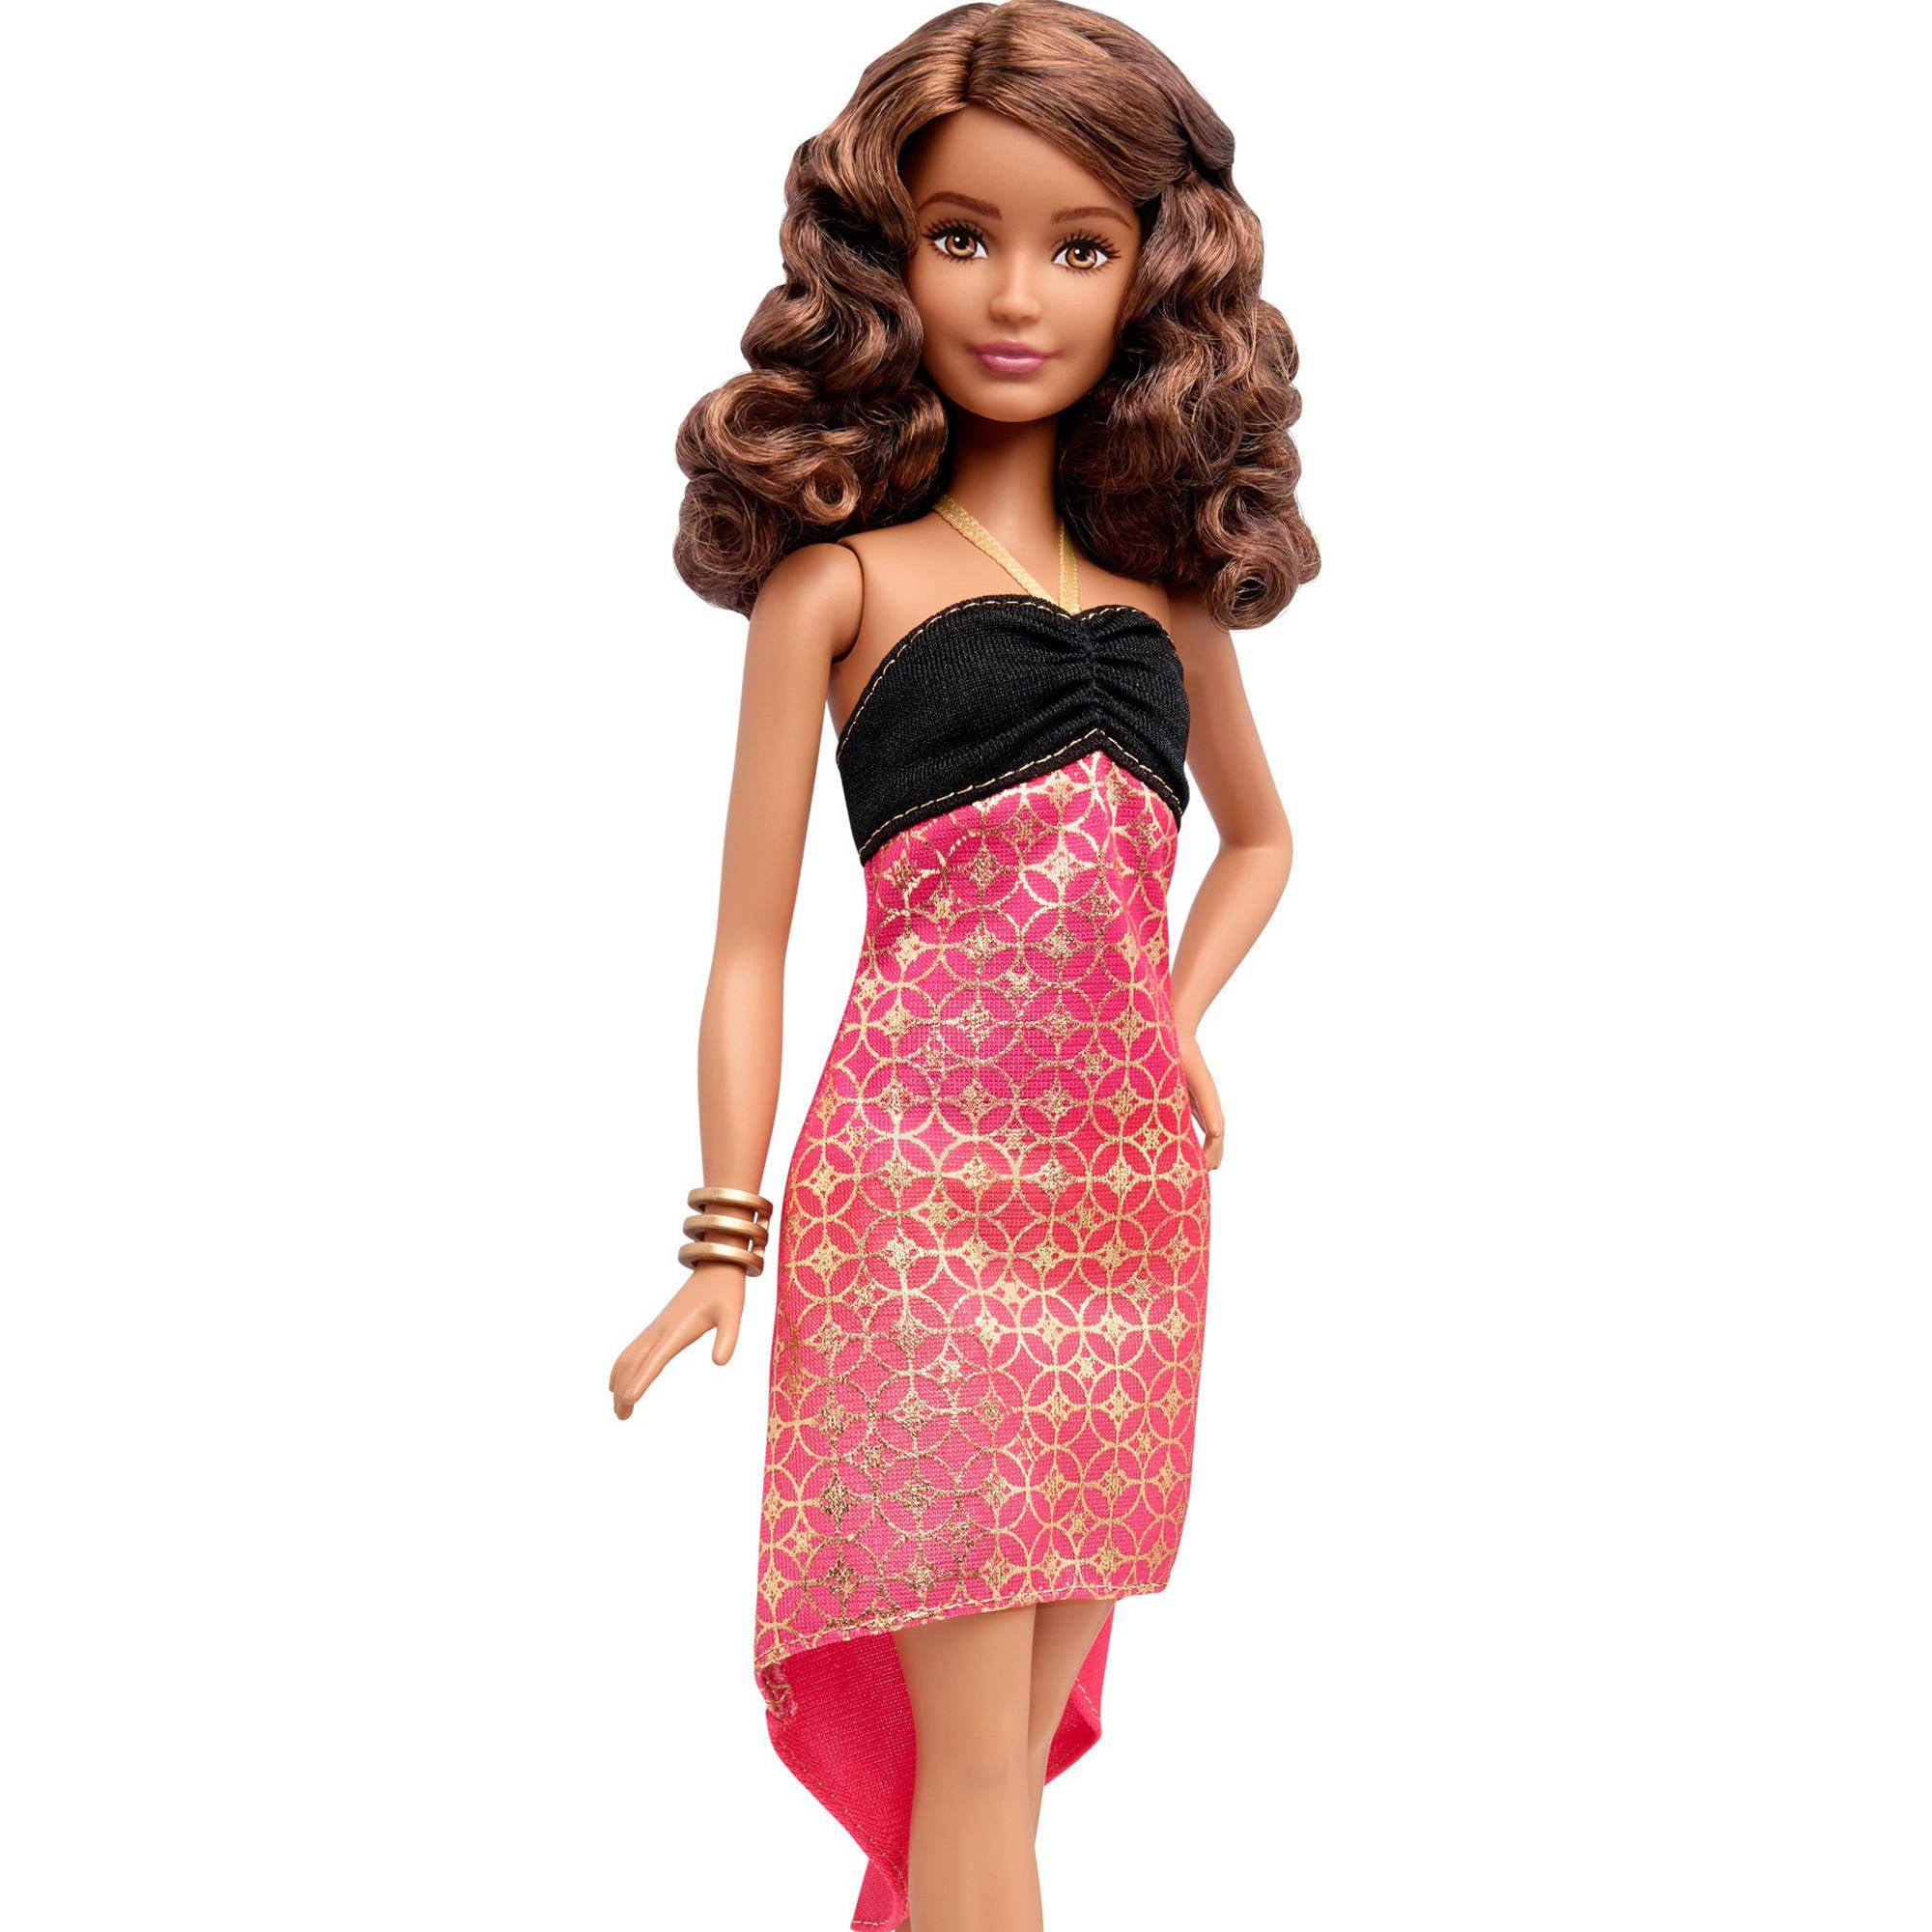 Barbie Fashionistas Doll 24, Crazy For Coral, Petite